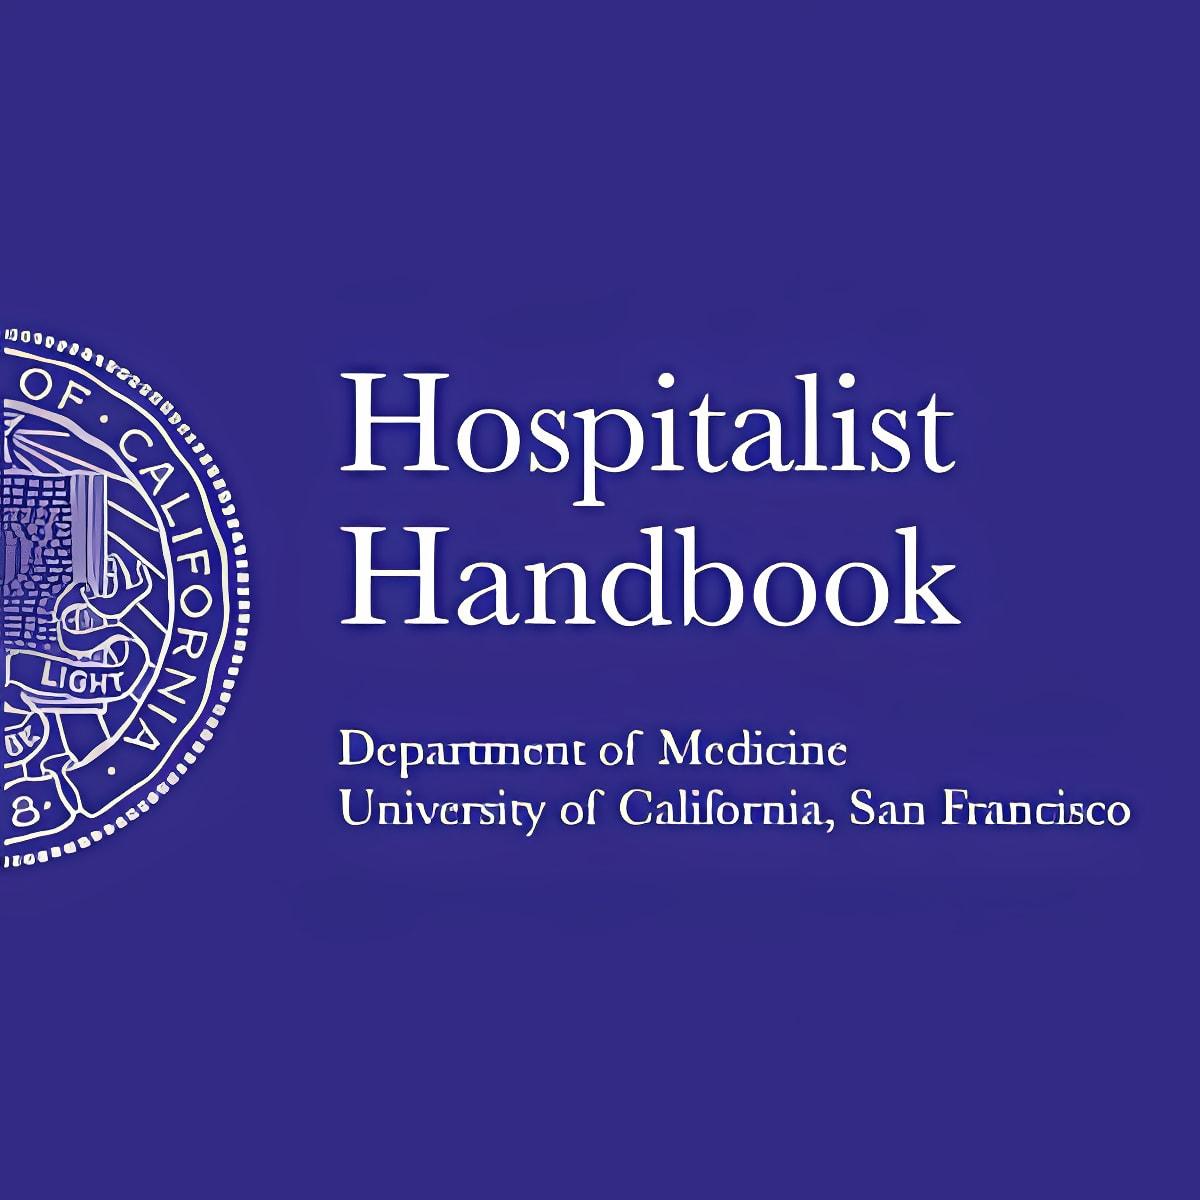 Hospitalist Handbook 6.0.0